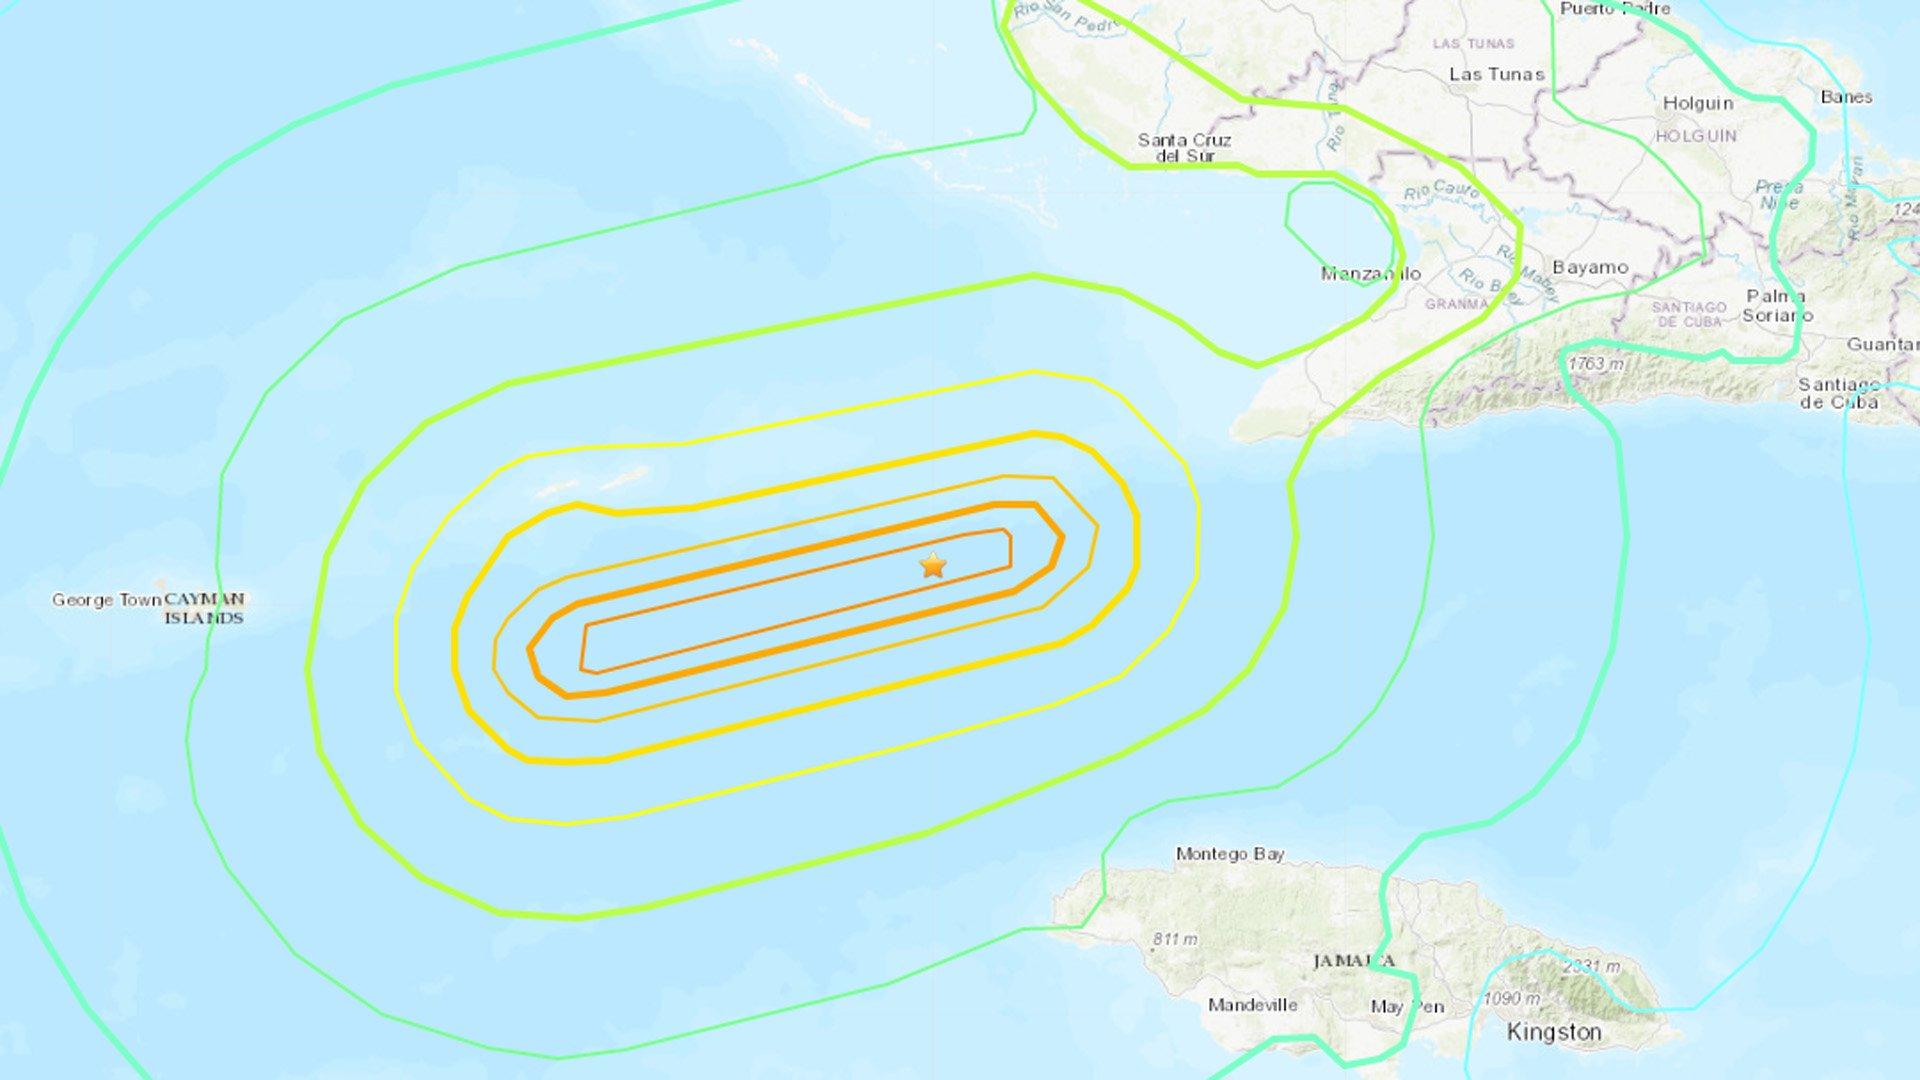 An earthquake strikes in the Caribbean Sea near Cuba and Jamaica on Jan. 28, 2020. (Credit: U.S. Geological Survey)